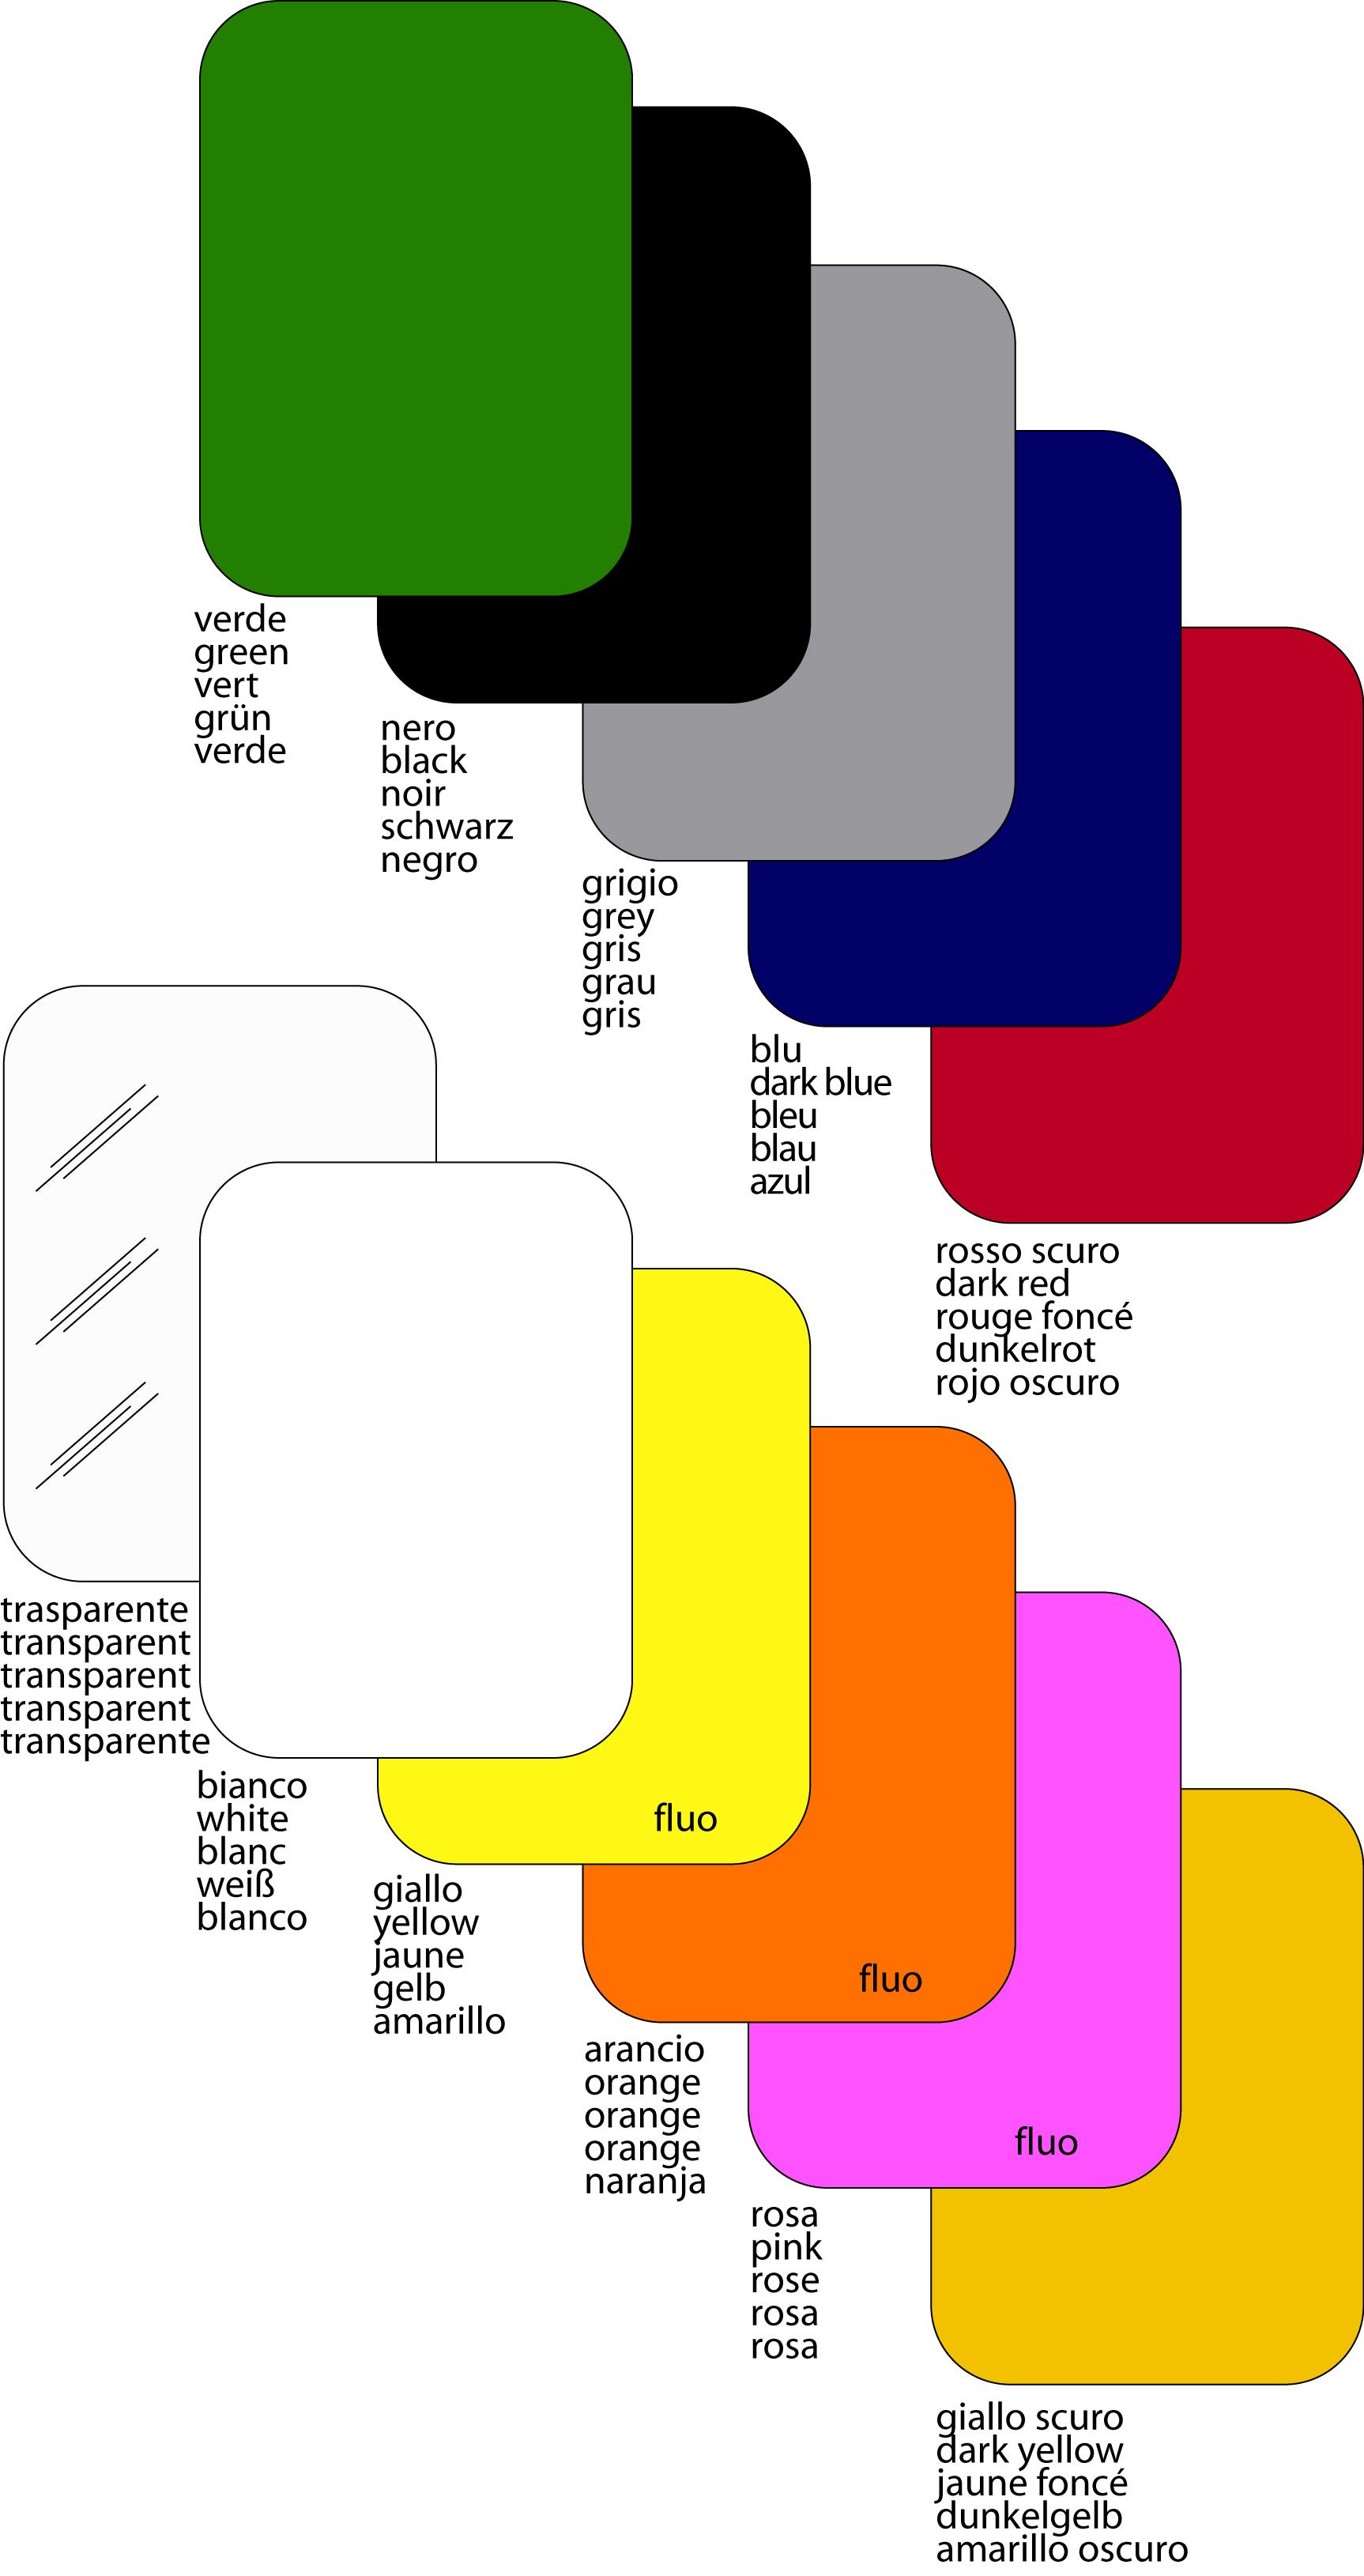 colori patch